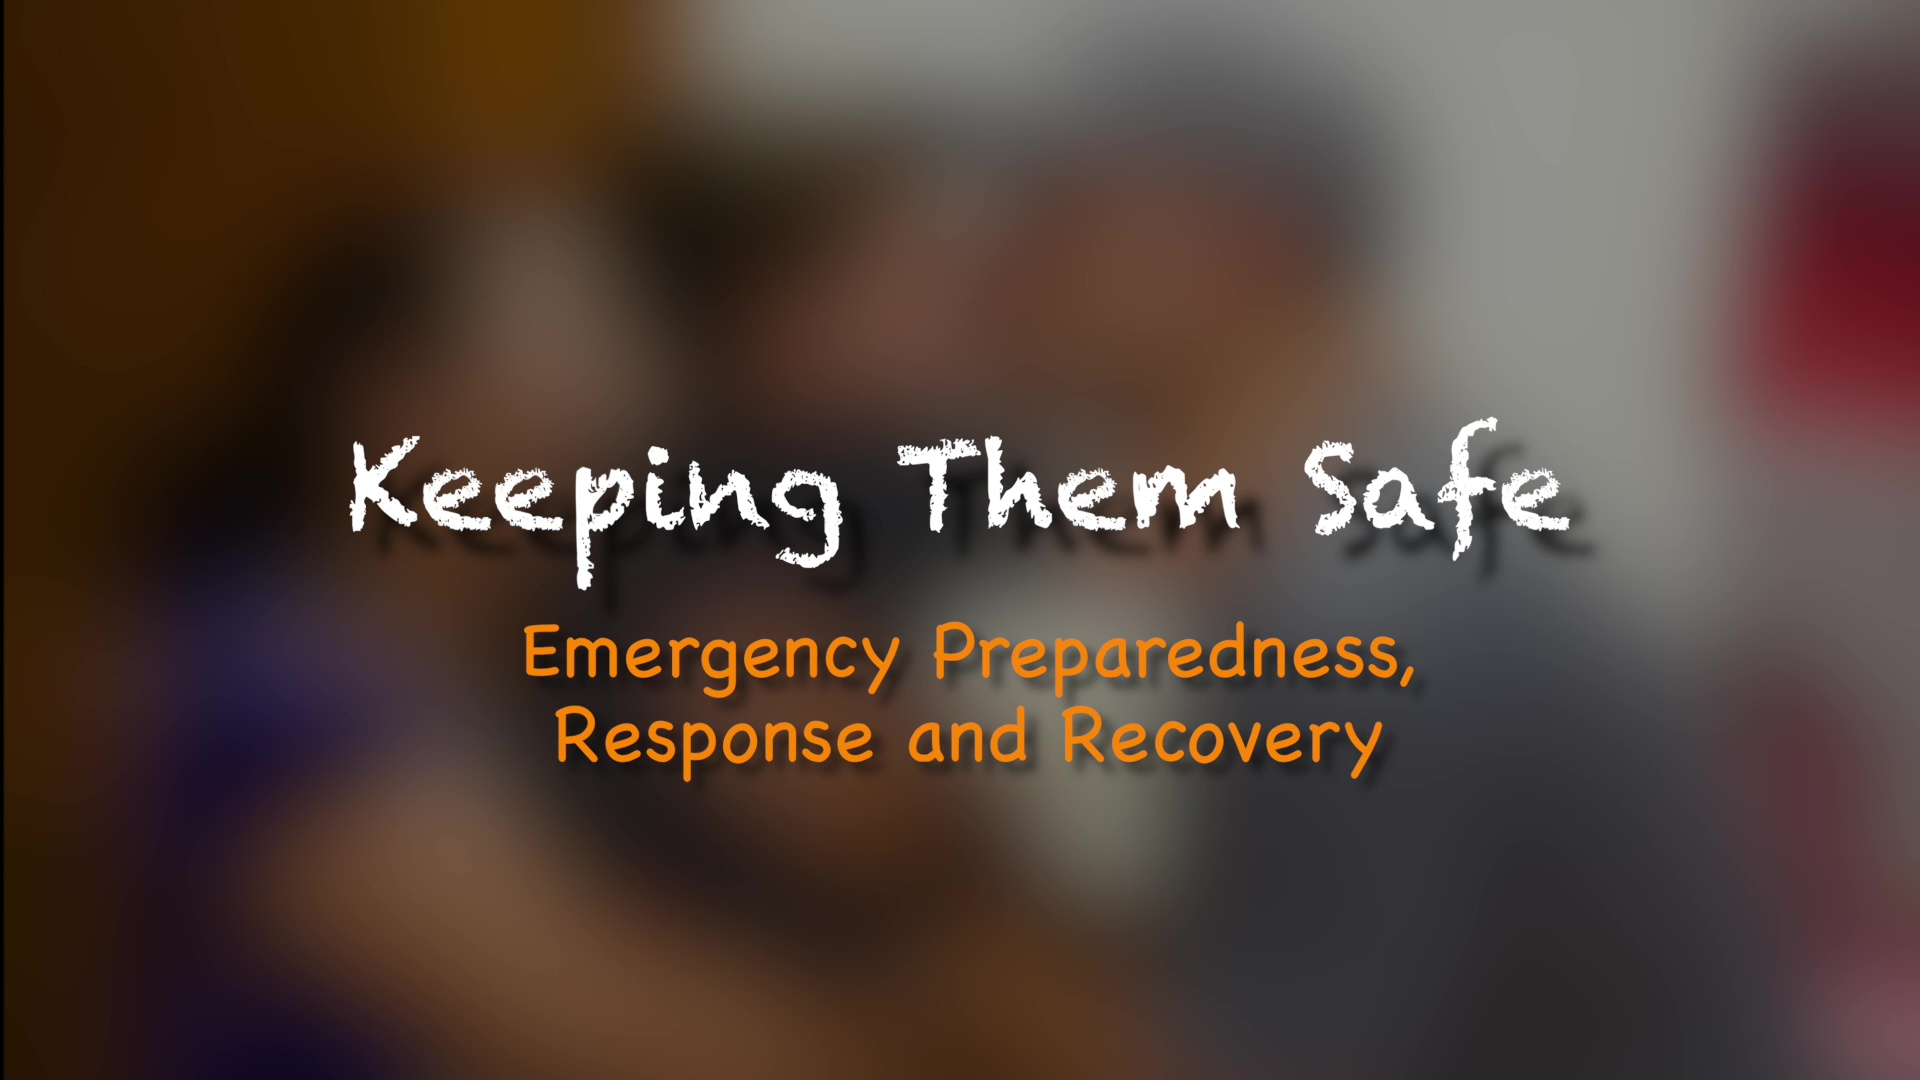 Emergency Preparedness, Response, and Recovery